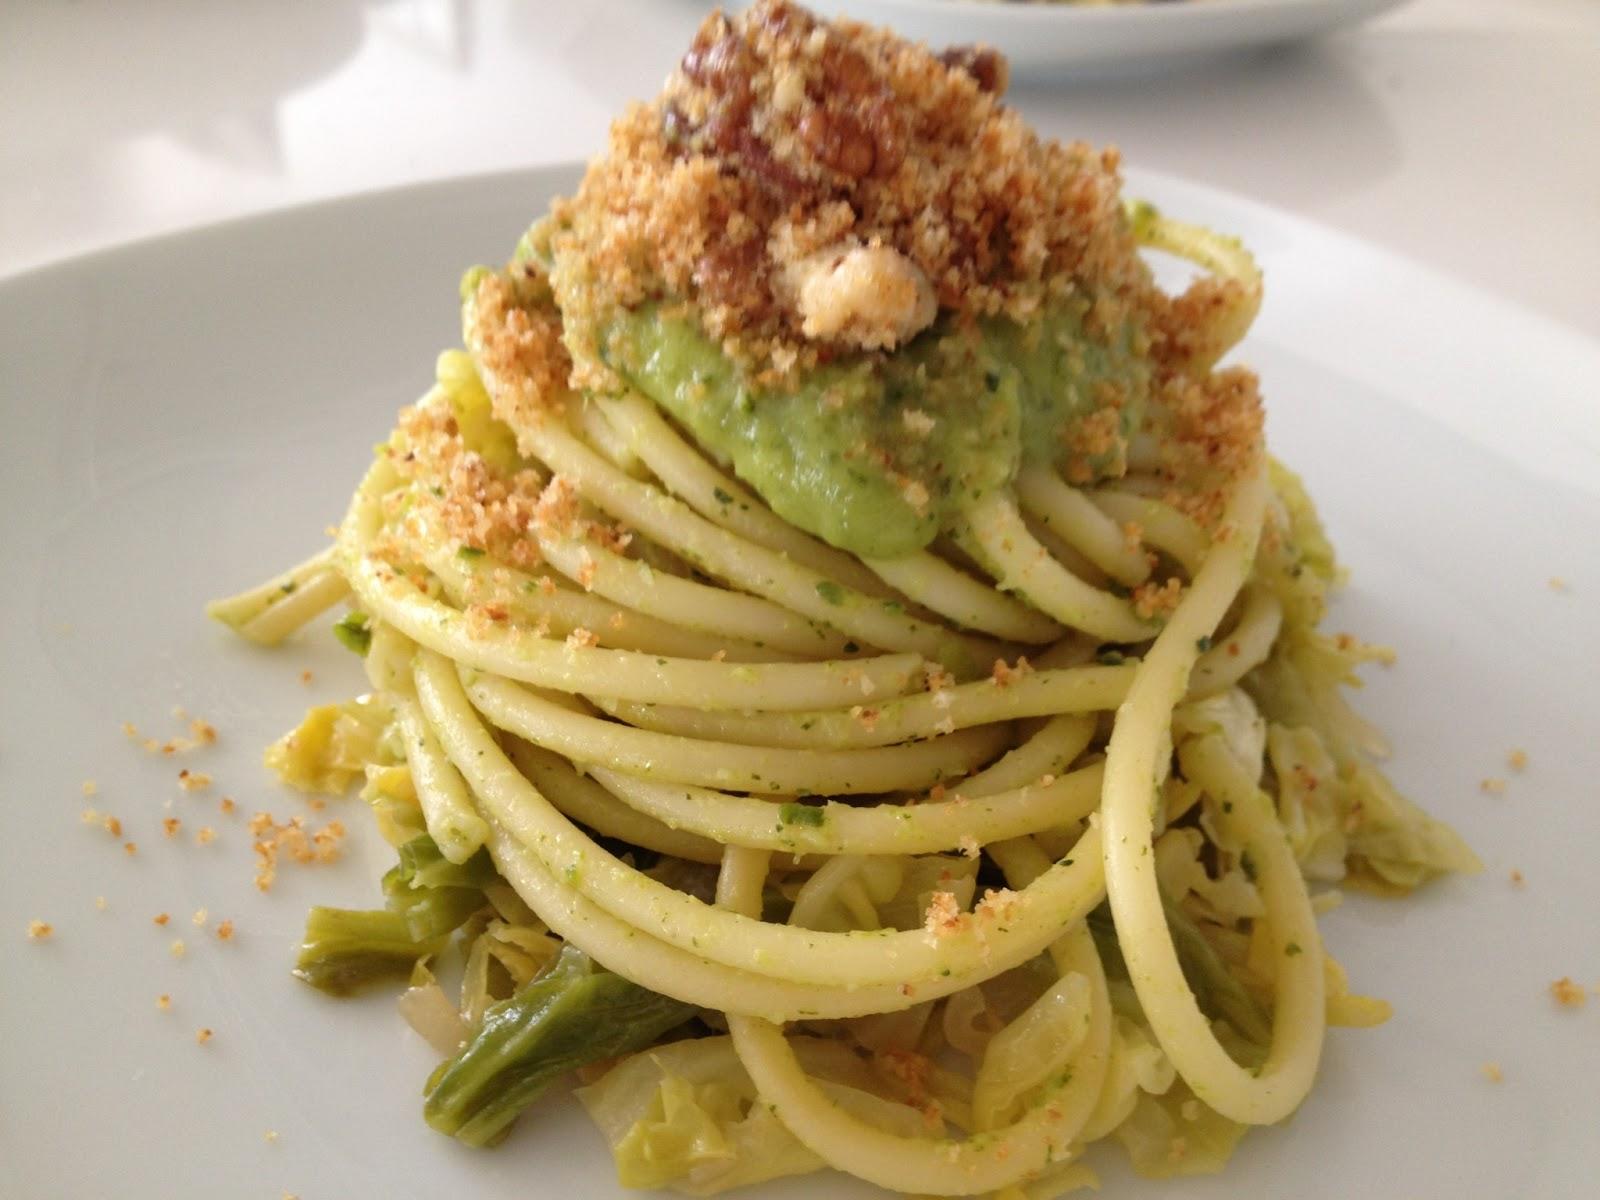 Tacco 12 in cucina spaghettoni alla crema di zucchine for In cucina ricette